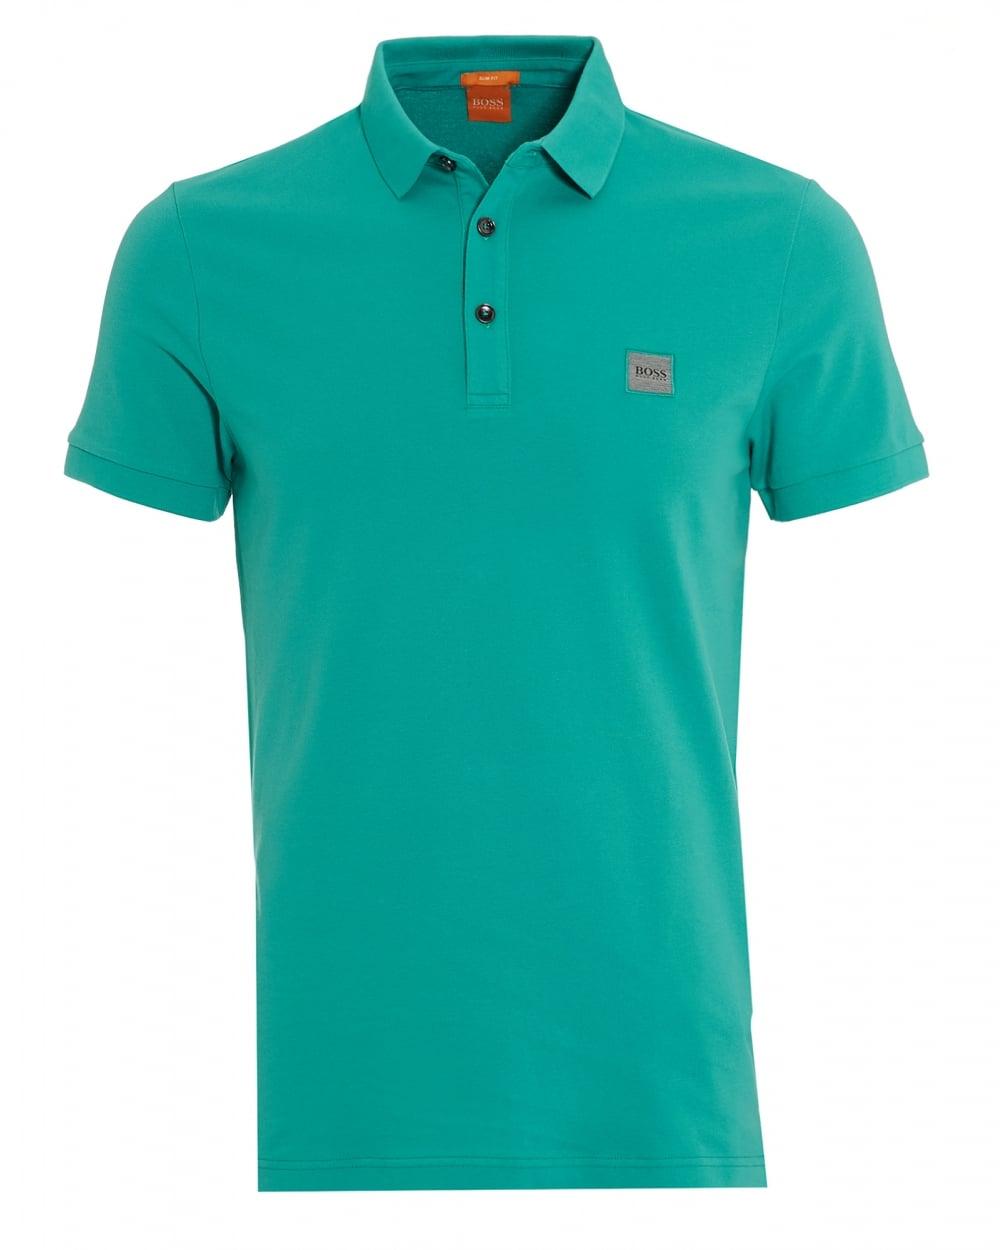 Hugo boss orange mens pavlik polo basic slim fit mint for Orange polo shirt mens